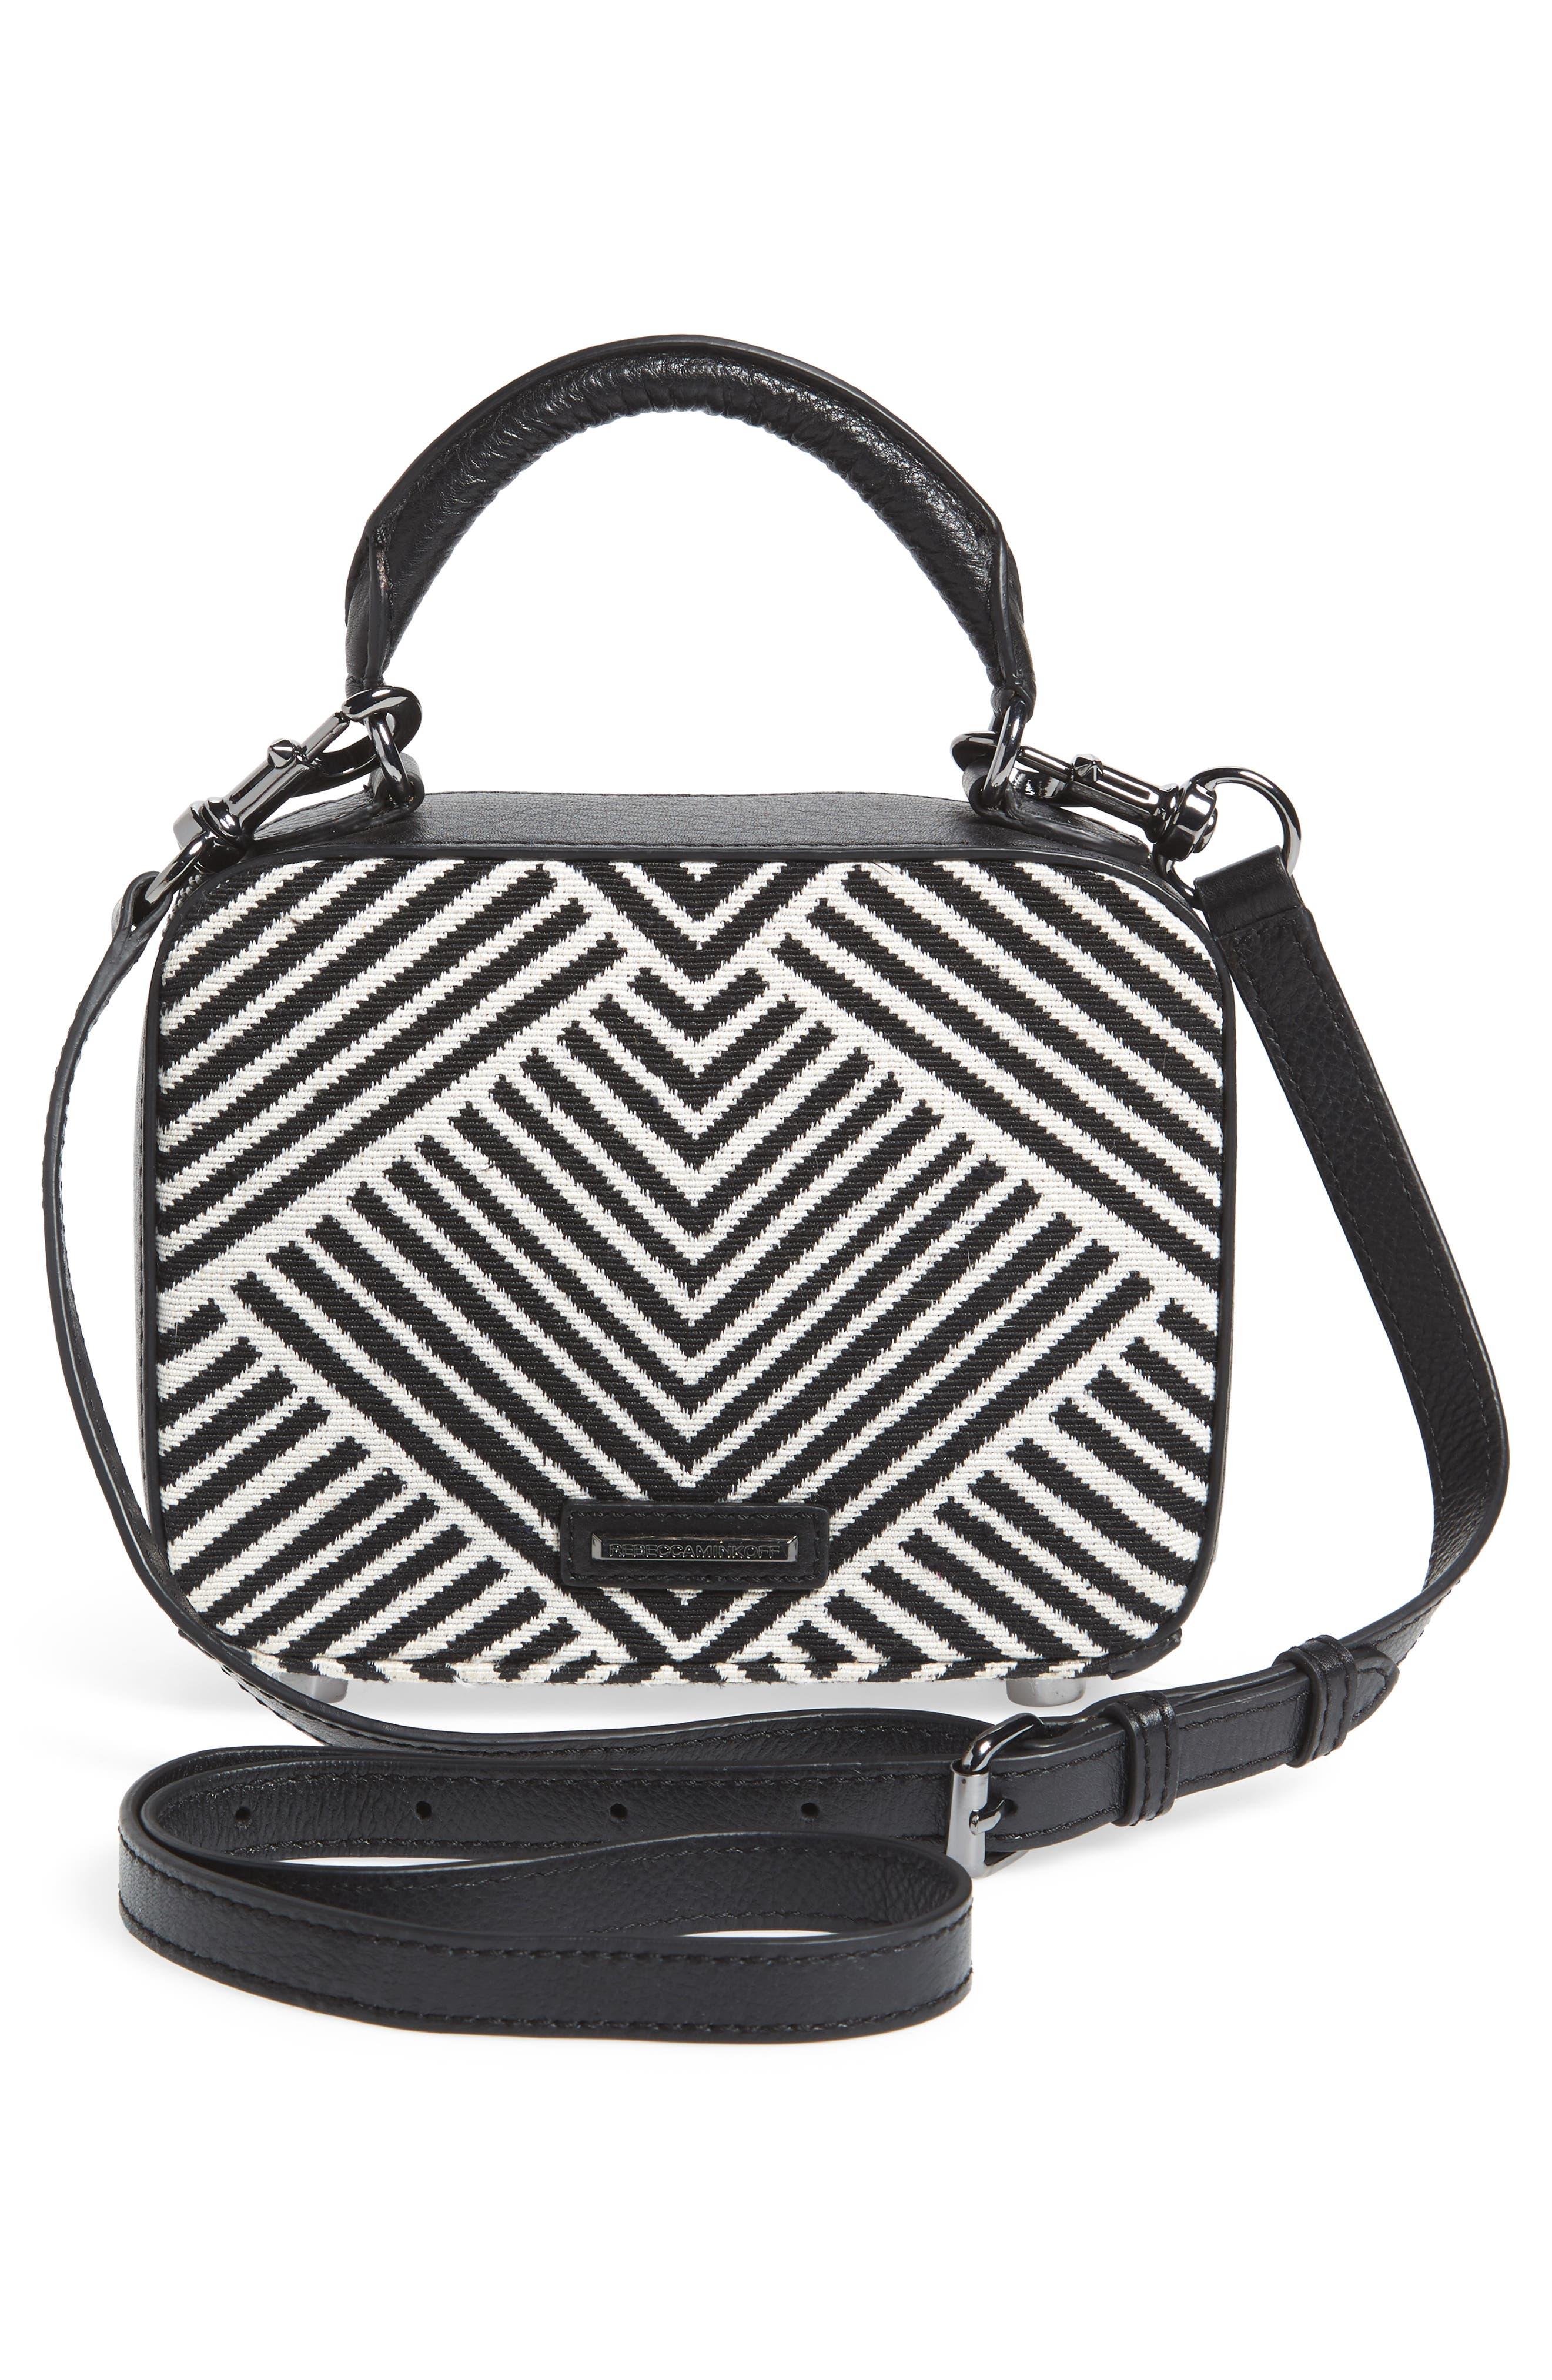 Wonder Box Embellished Crossbody Bag,                             Alternate thumbnail 3, color,                             Black Metallic Multi